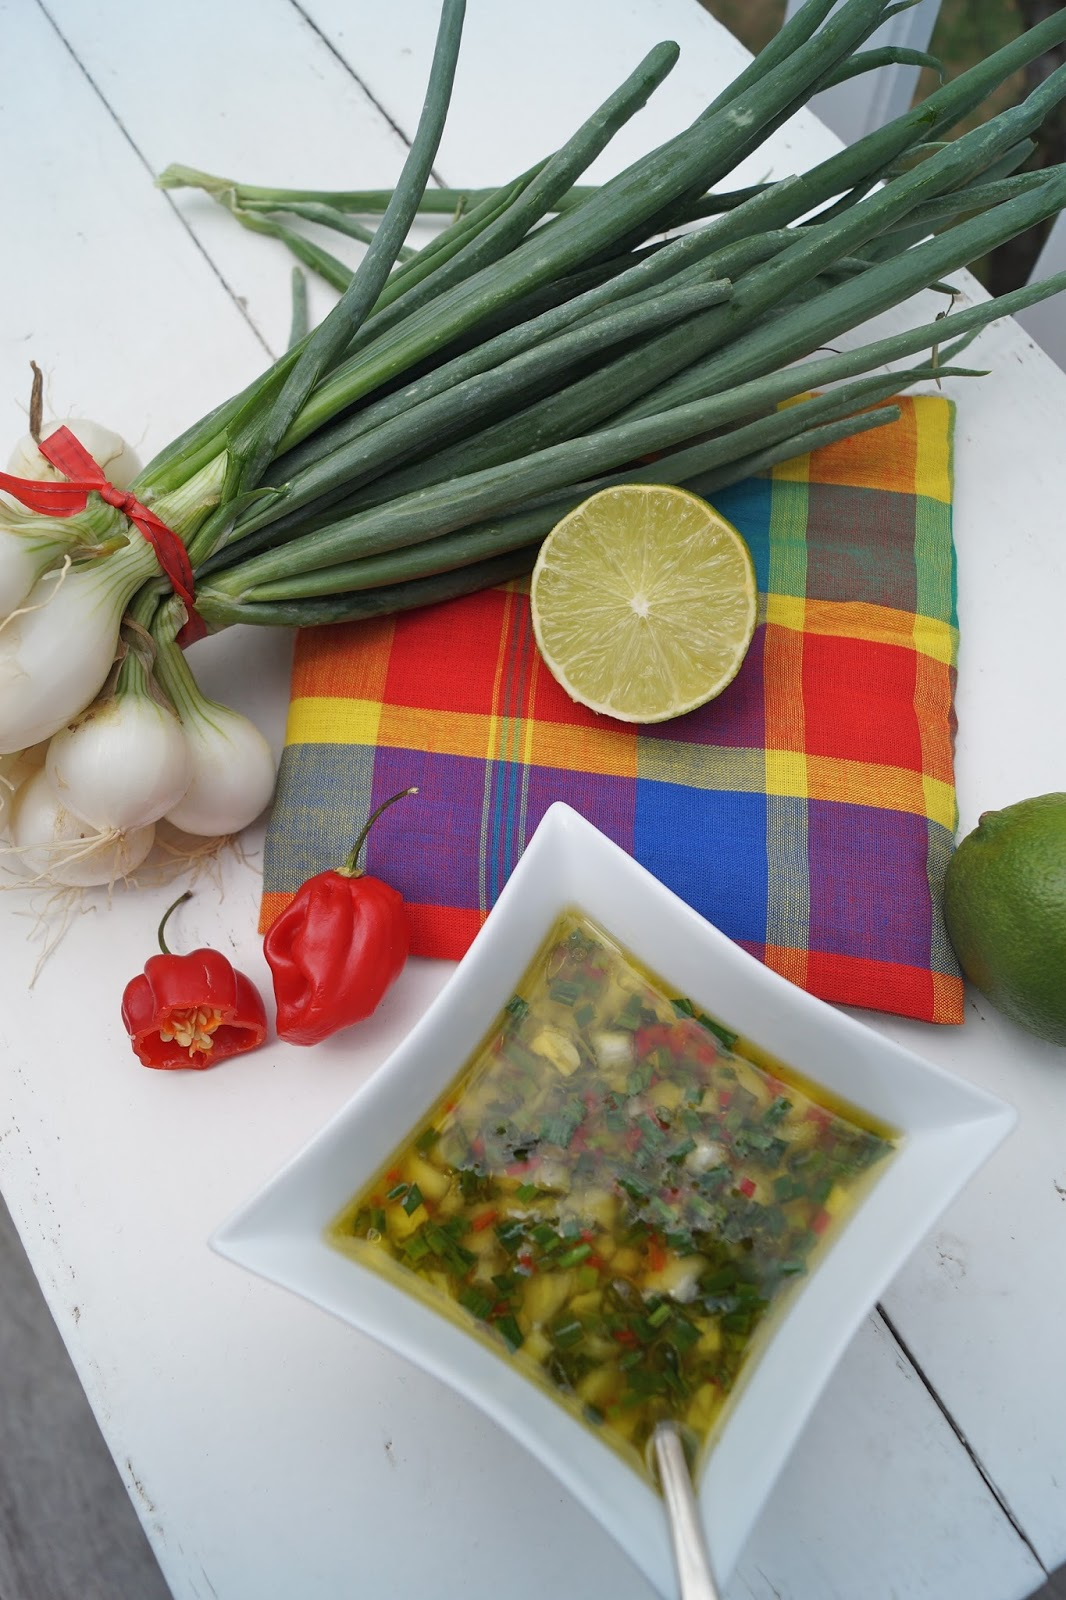 Poisson Grill Avec Sa Sauce Chien Persil Oignons Pays Citron